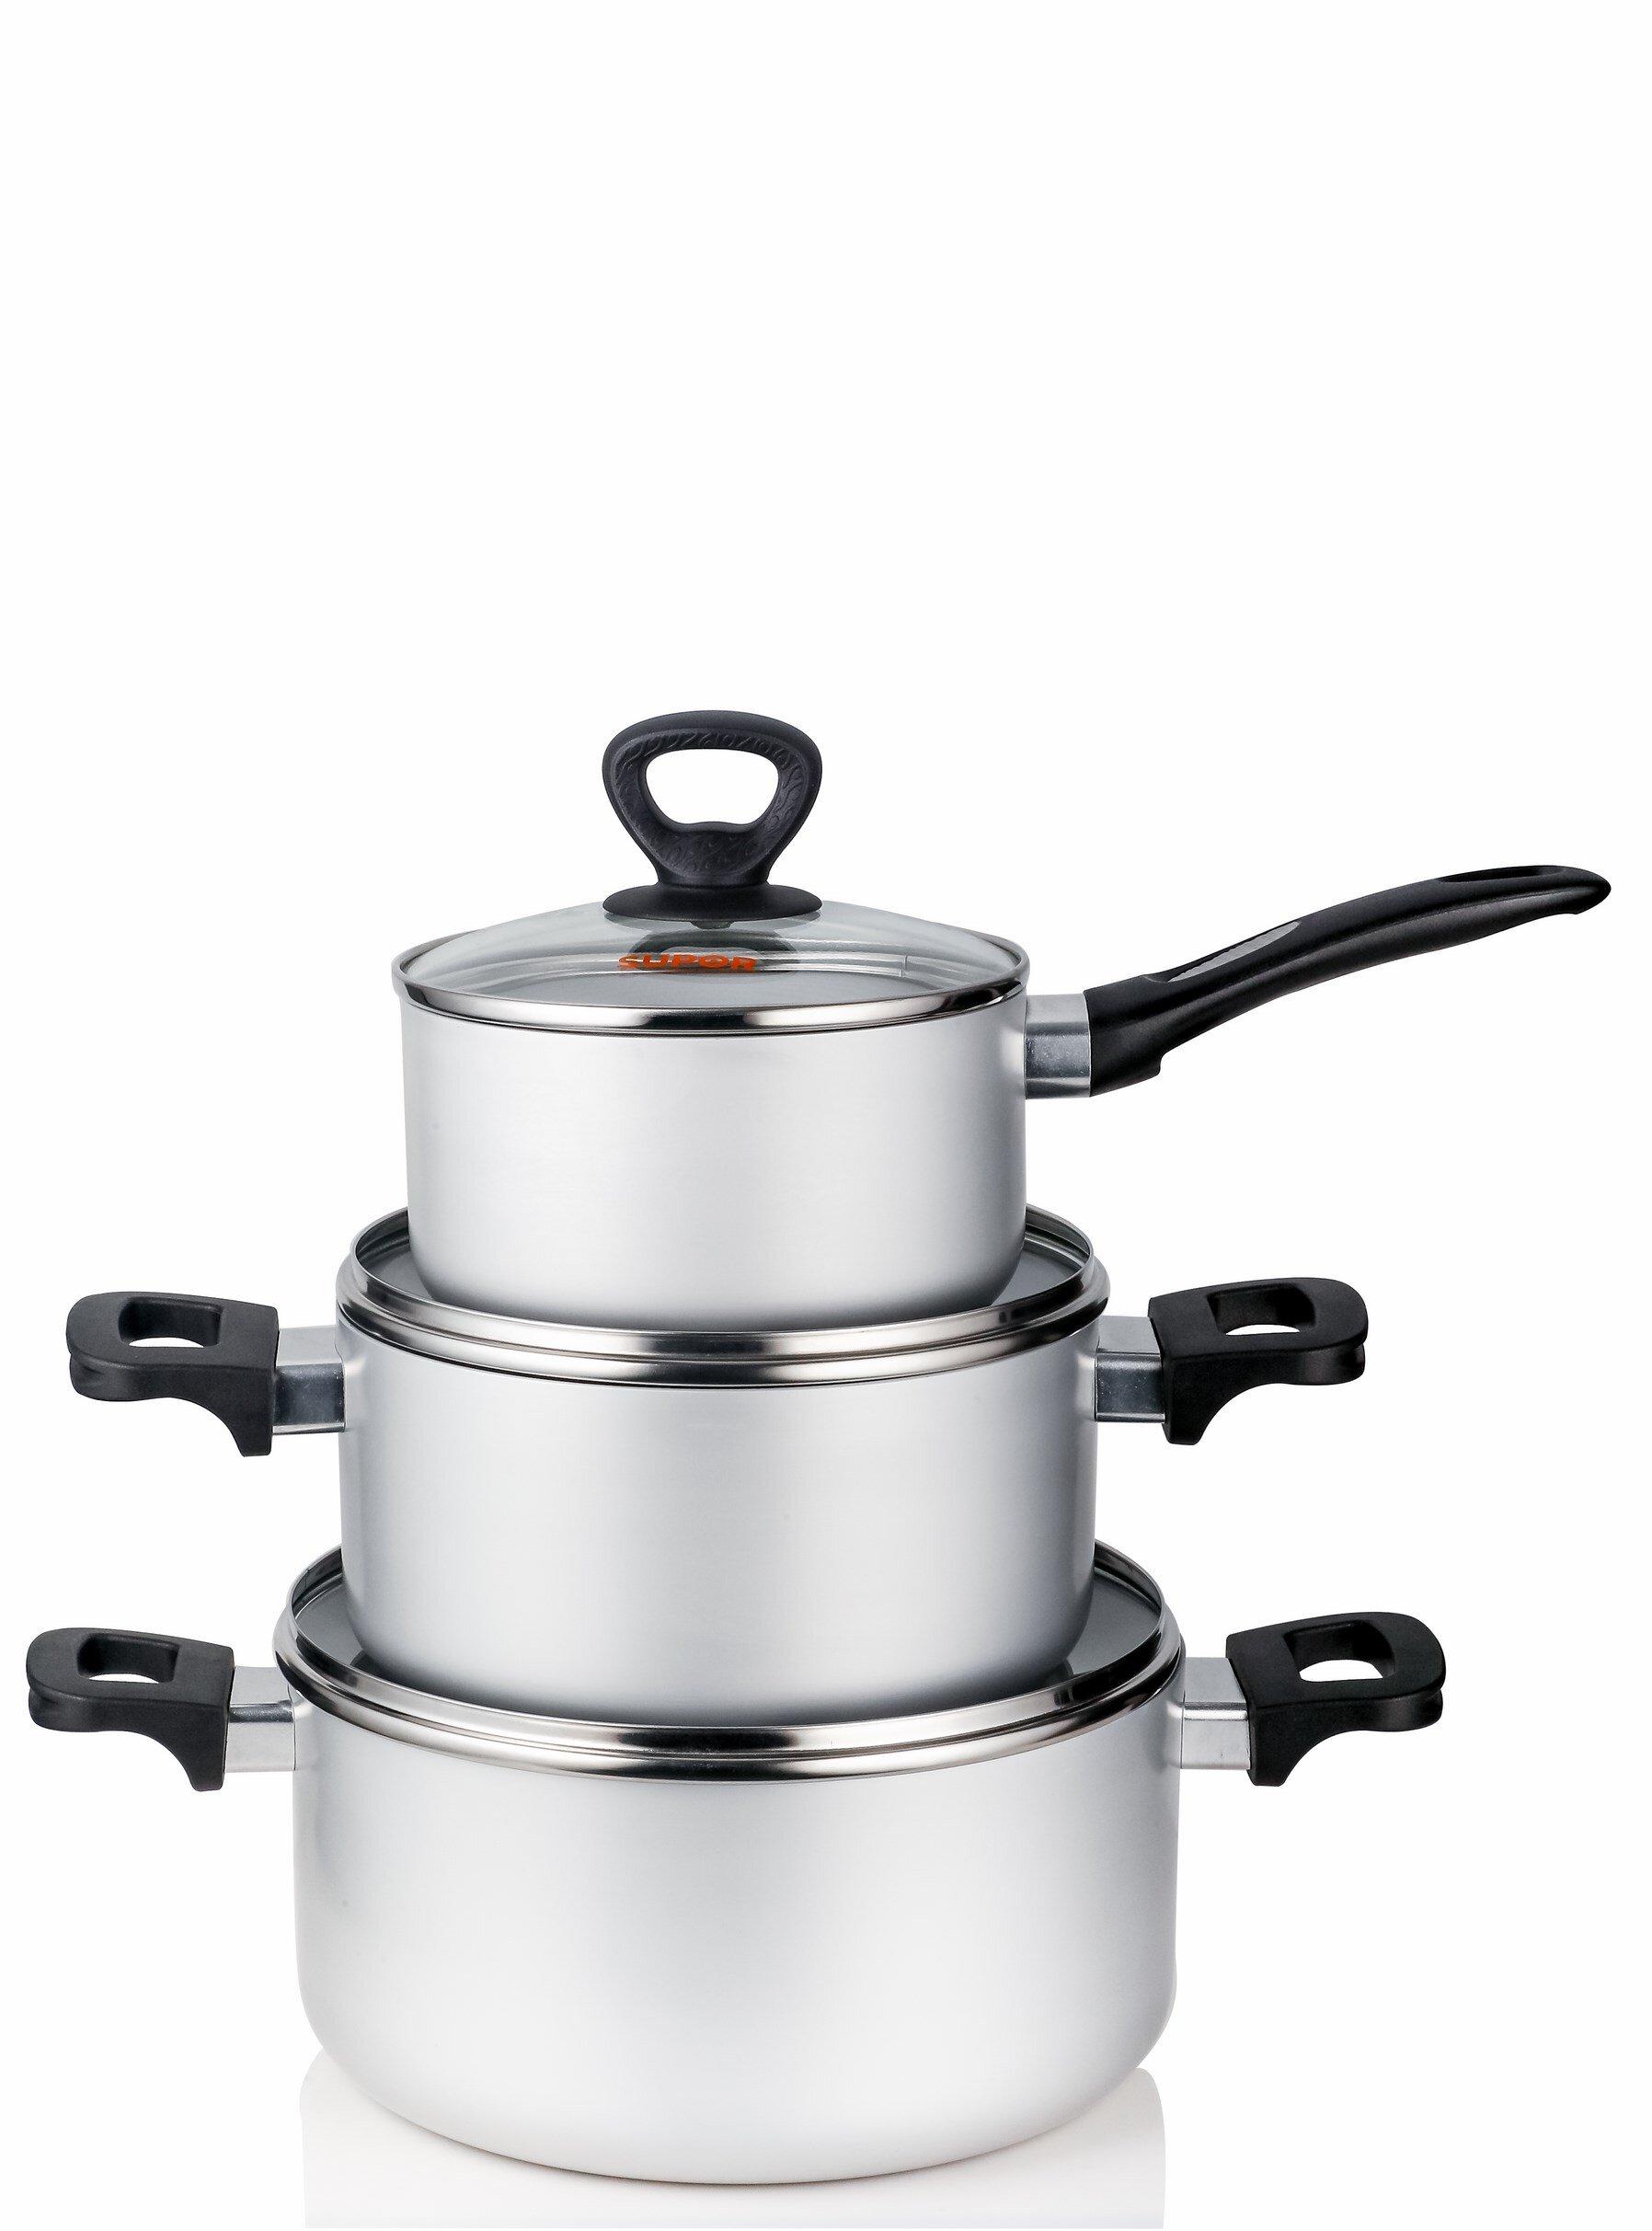 Bộ nồi nấu ăn Supor S30A-T1